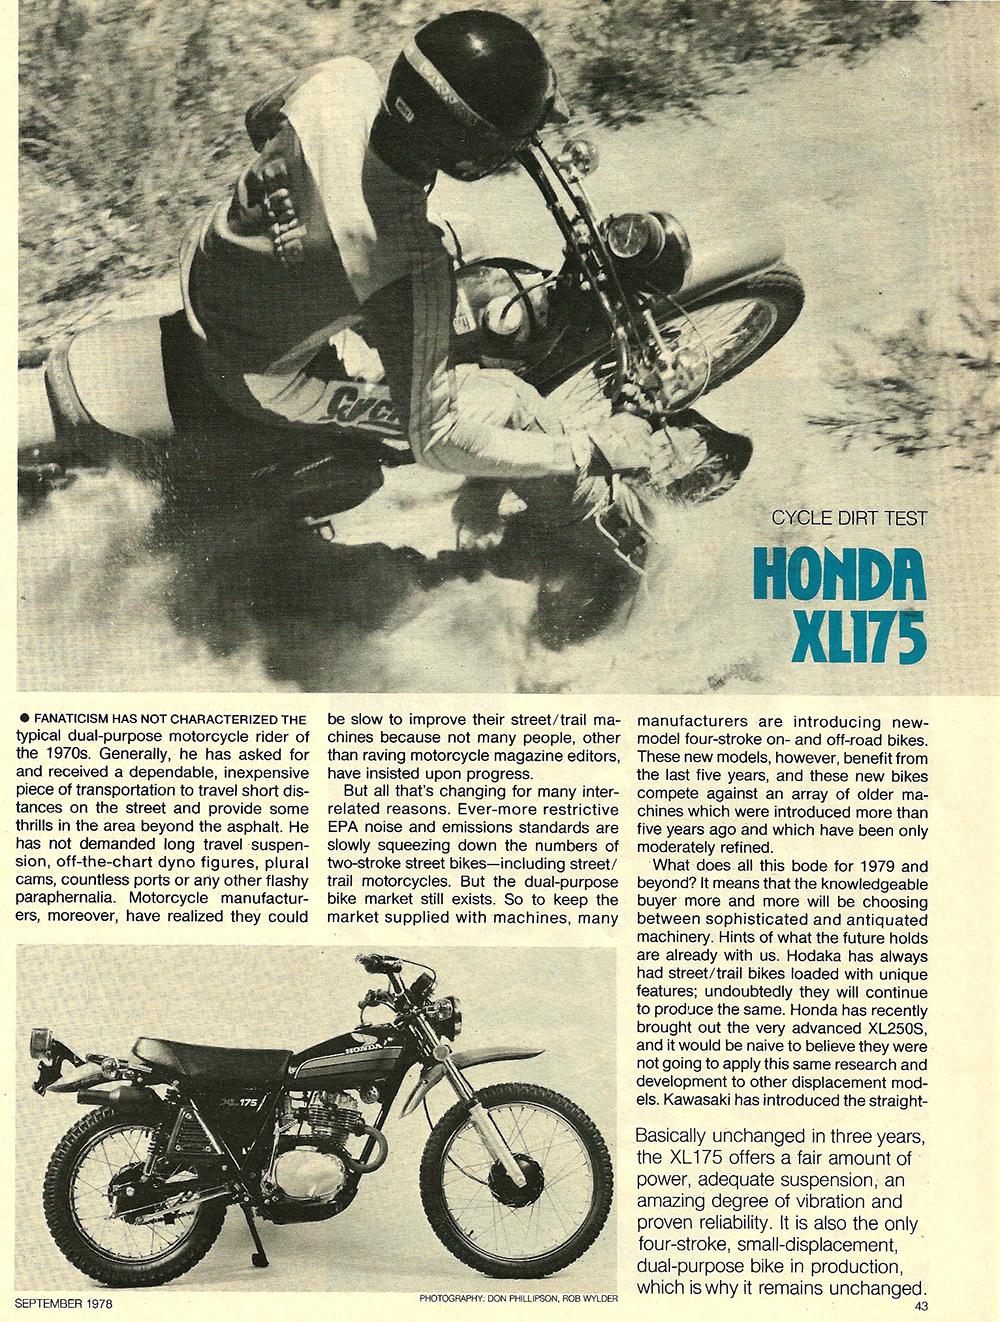 1978 Honda XL175 road test 01.jpg